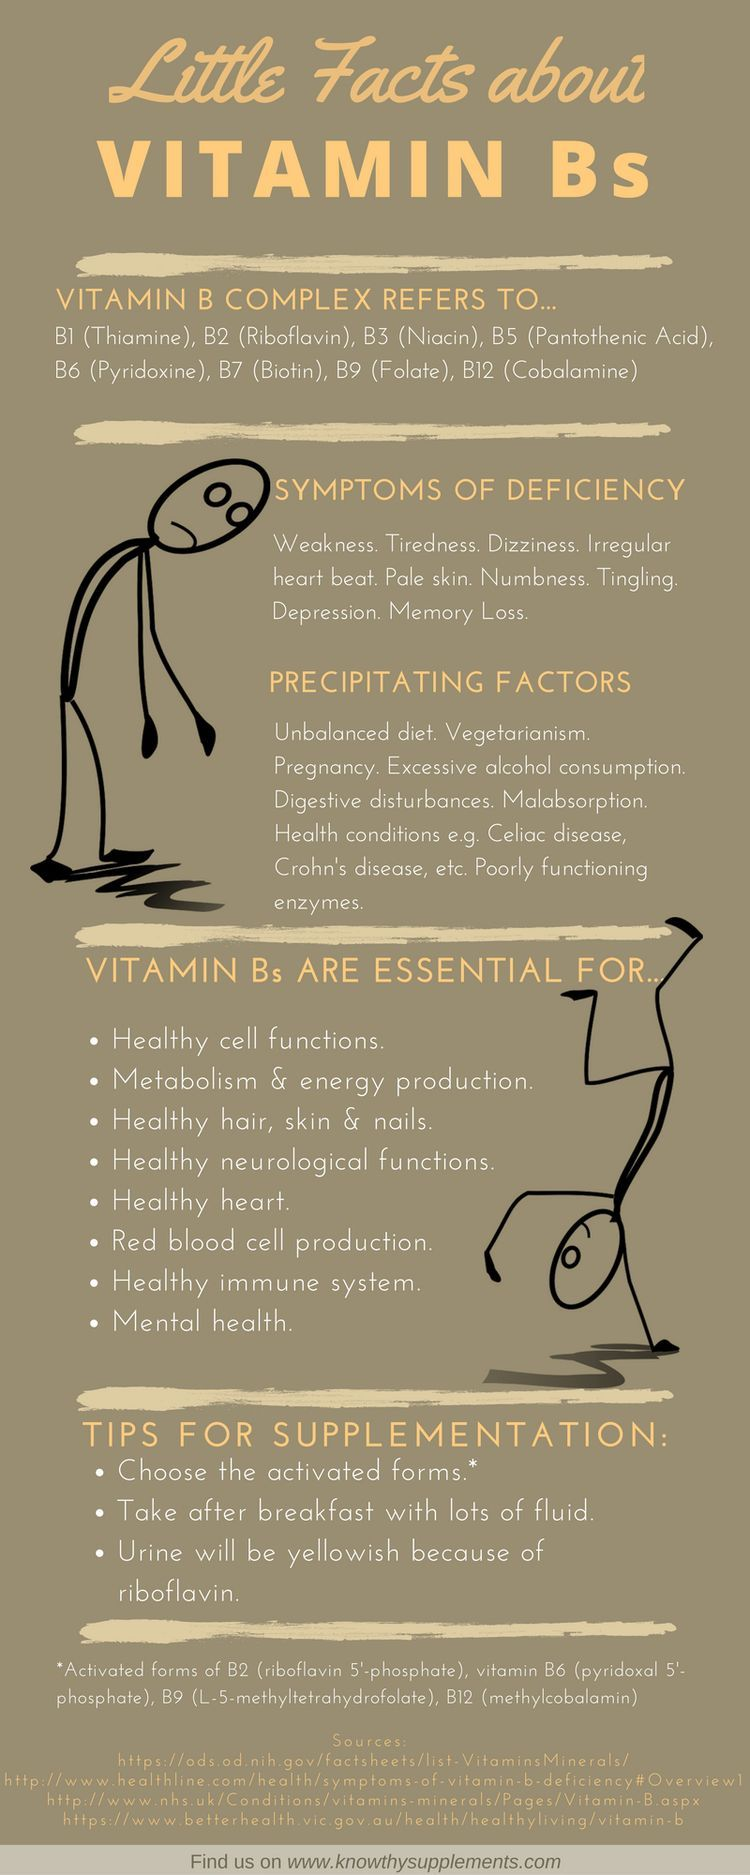 vitamine b12 thiamine